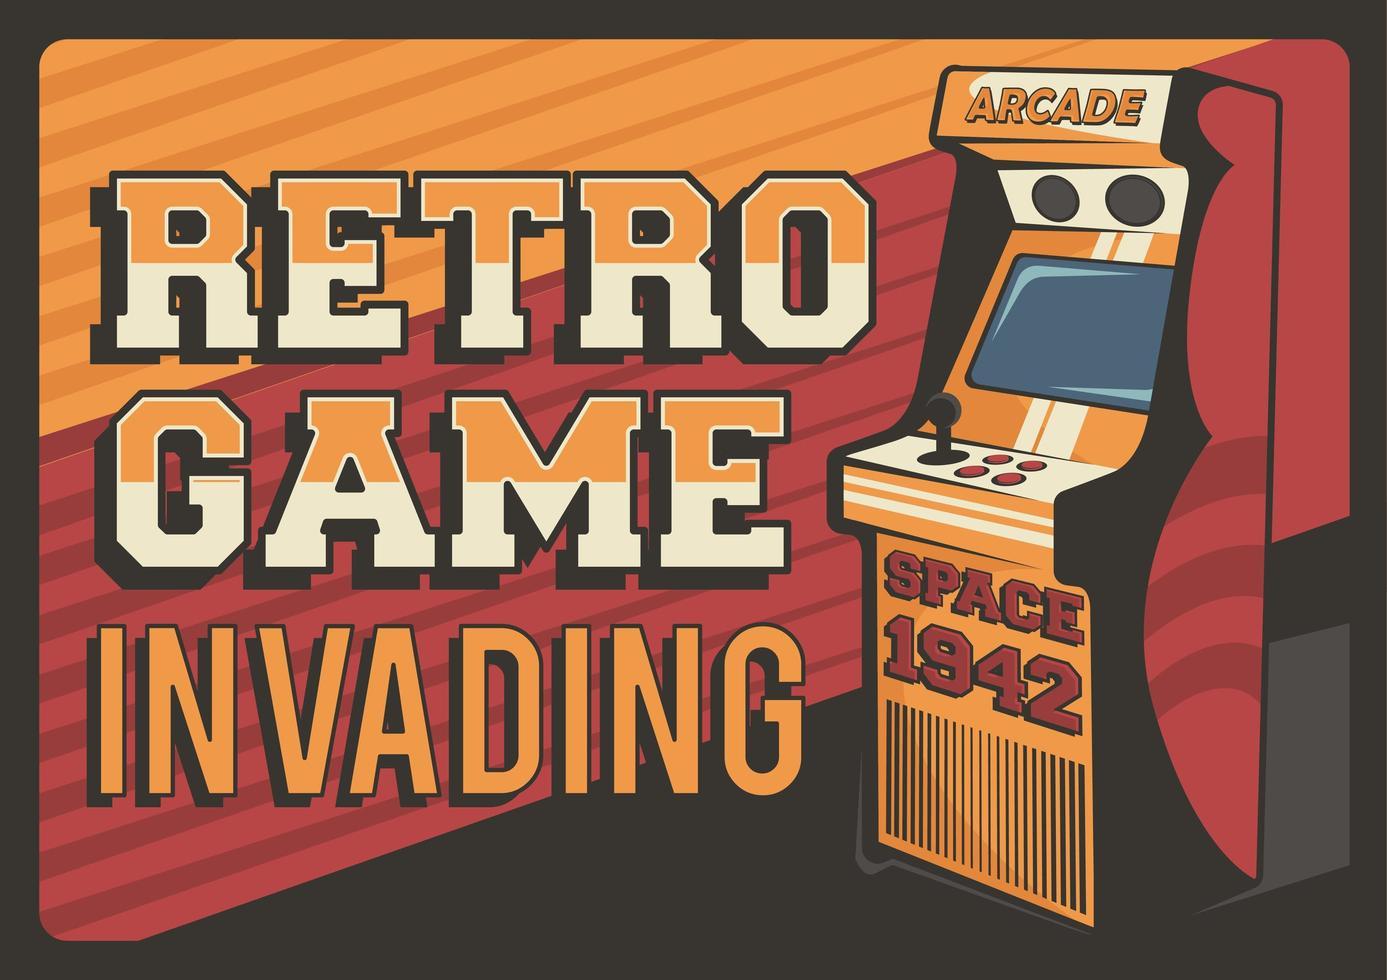 Retro Game Invading Poster vector